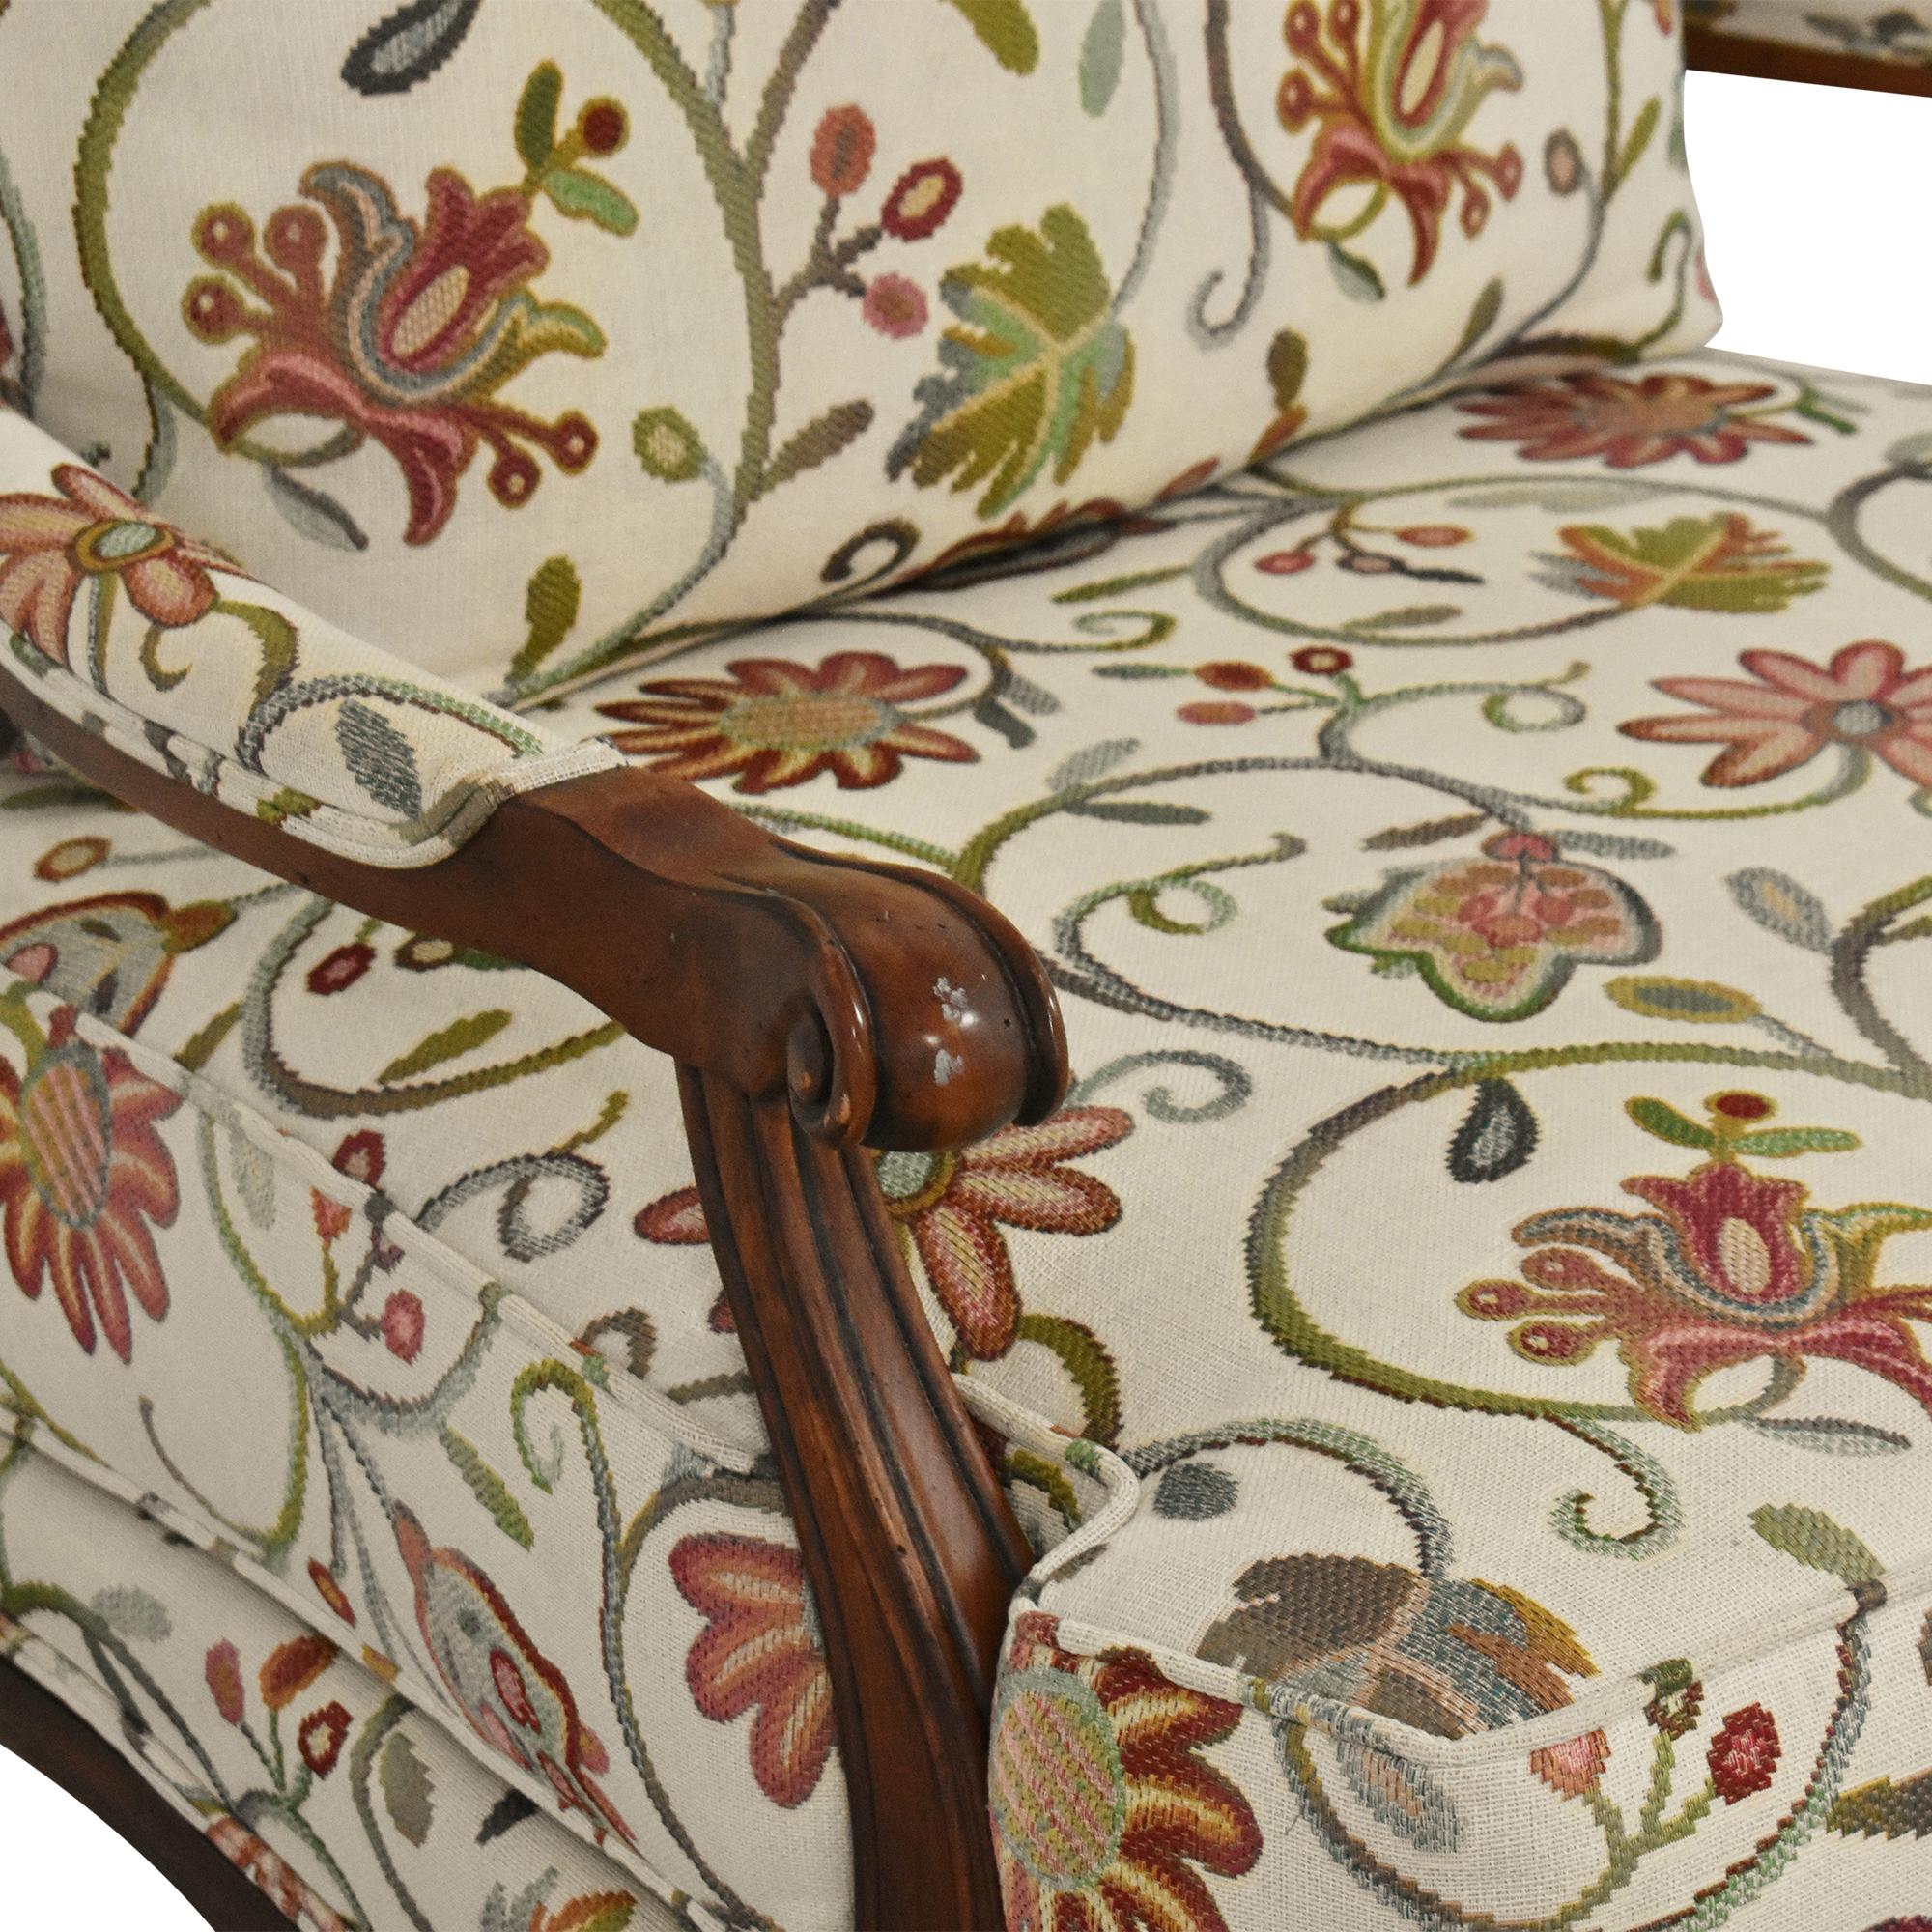 Ethan Allen Ethan Allen Harris Floral Chair nj